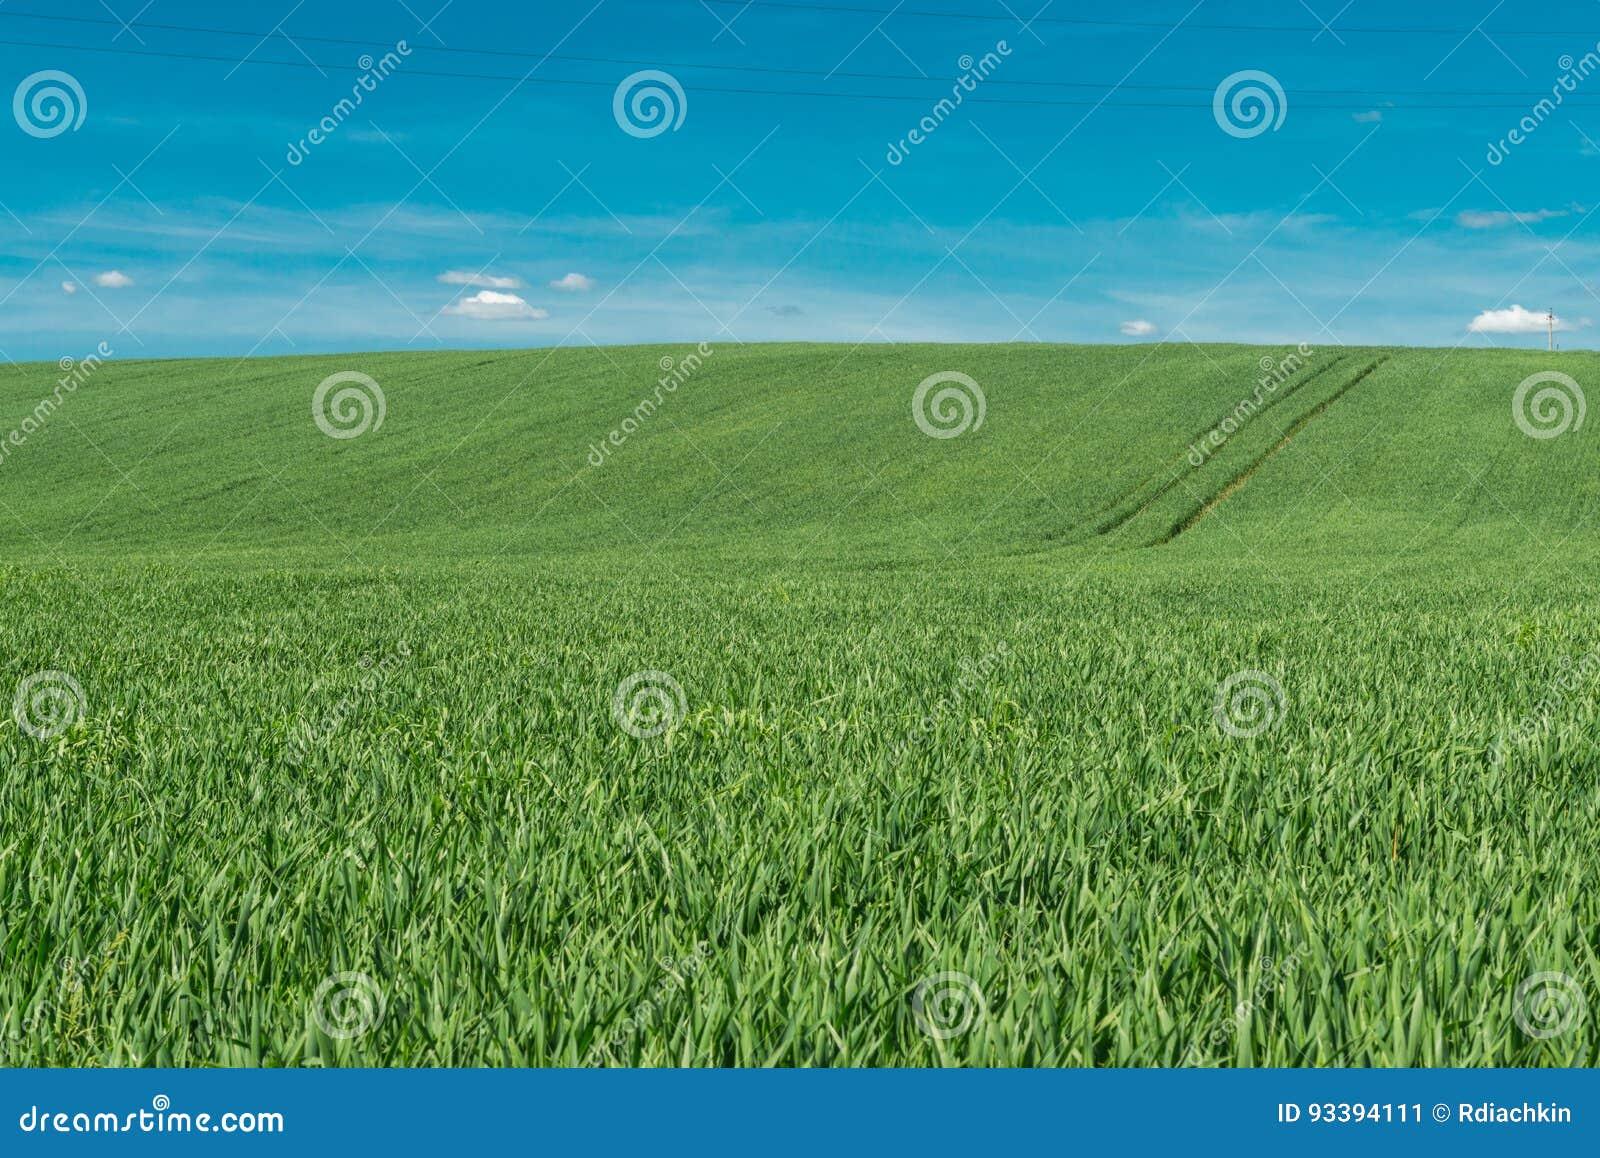 Spikelets av grönt vete mot den blåa himlen